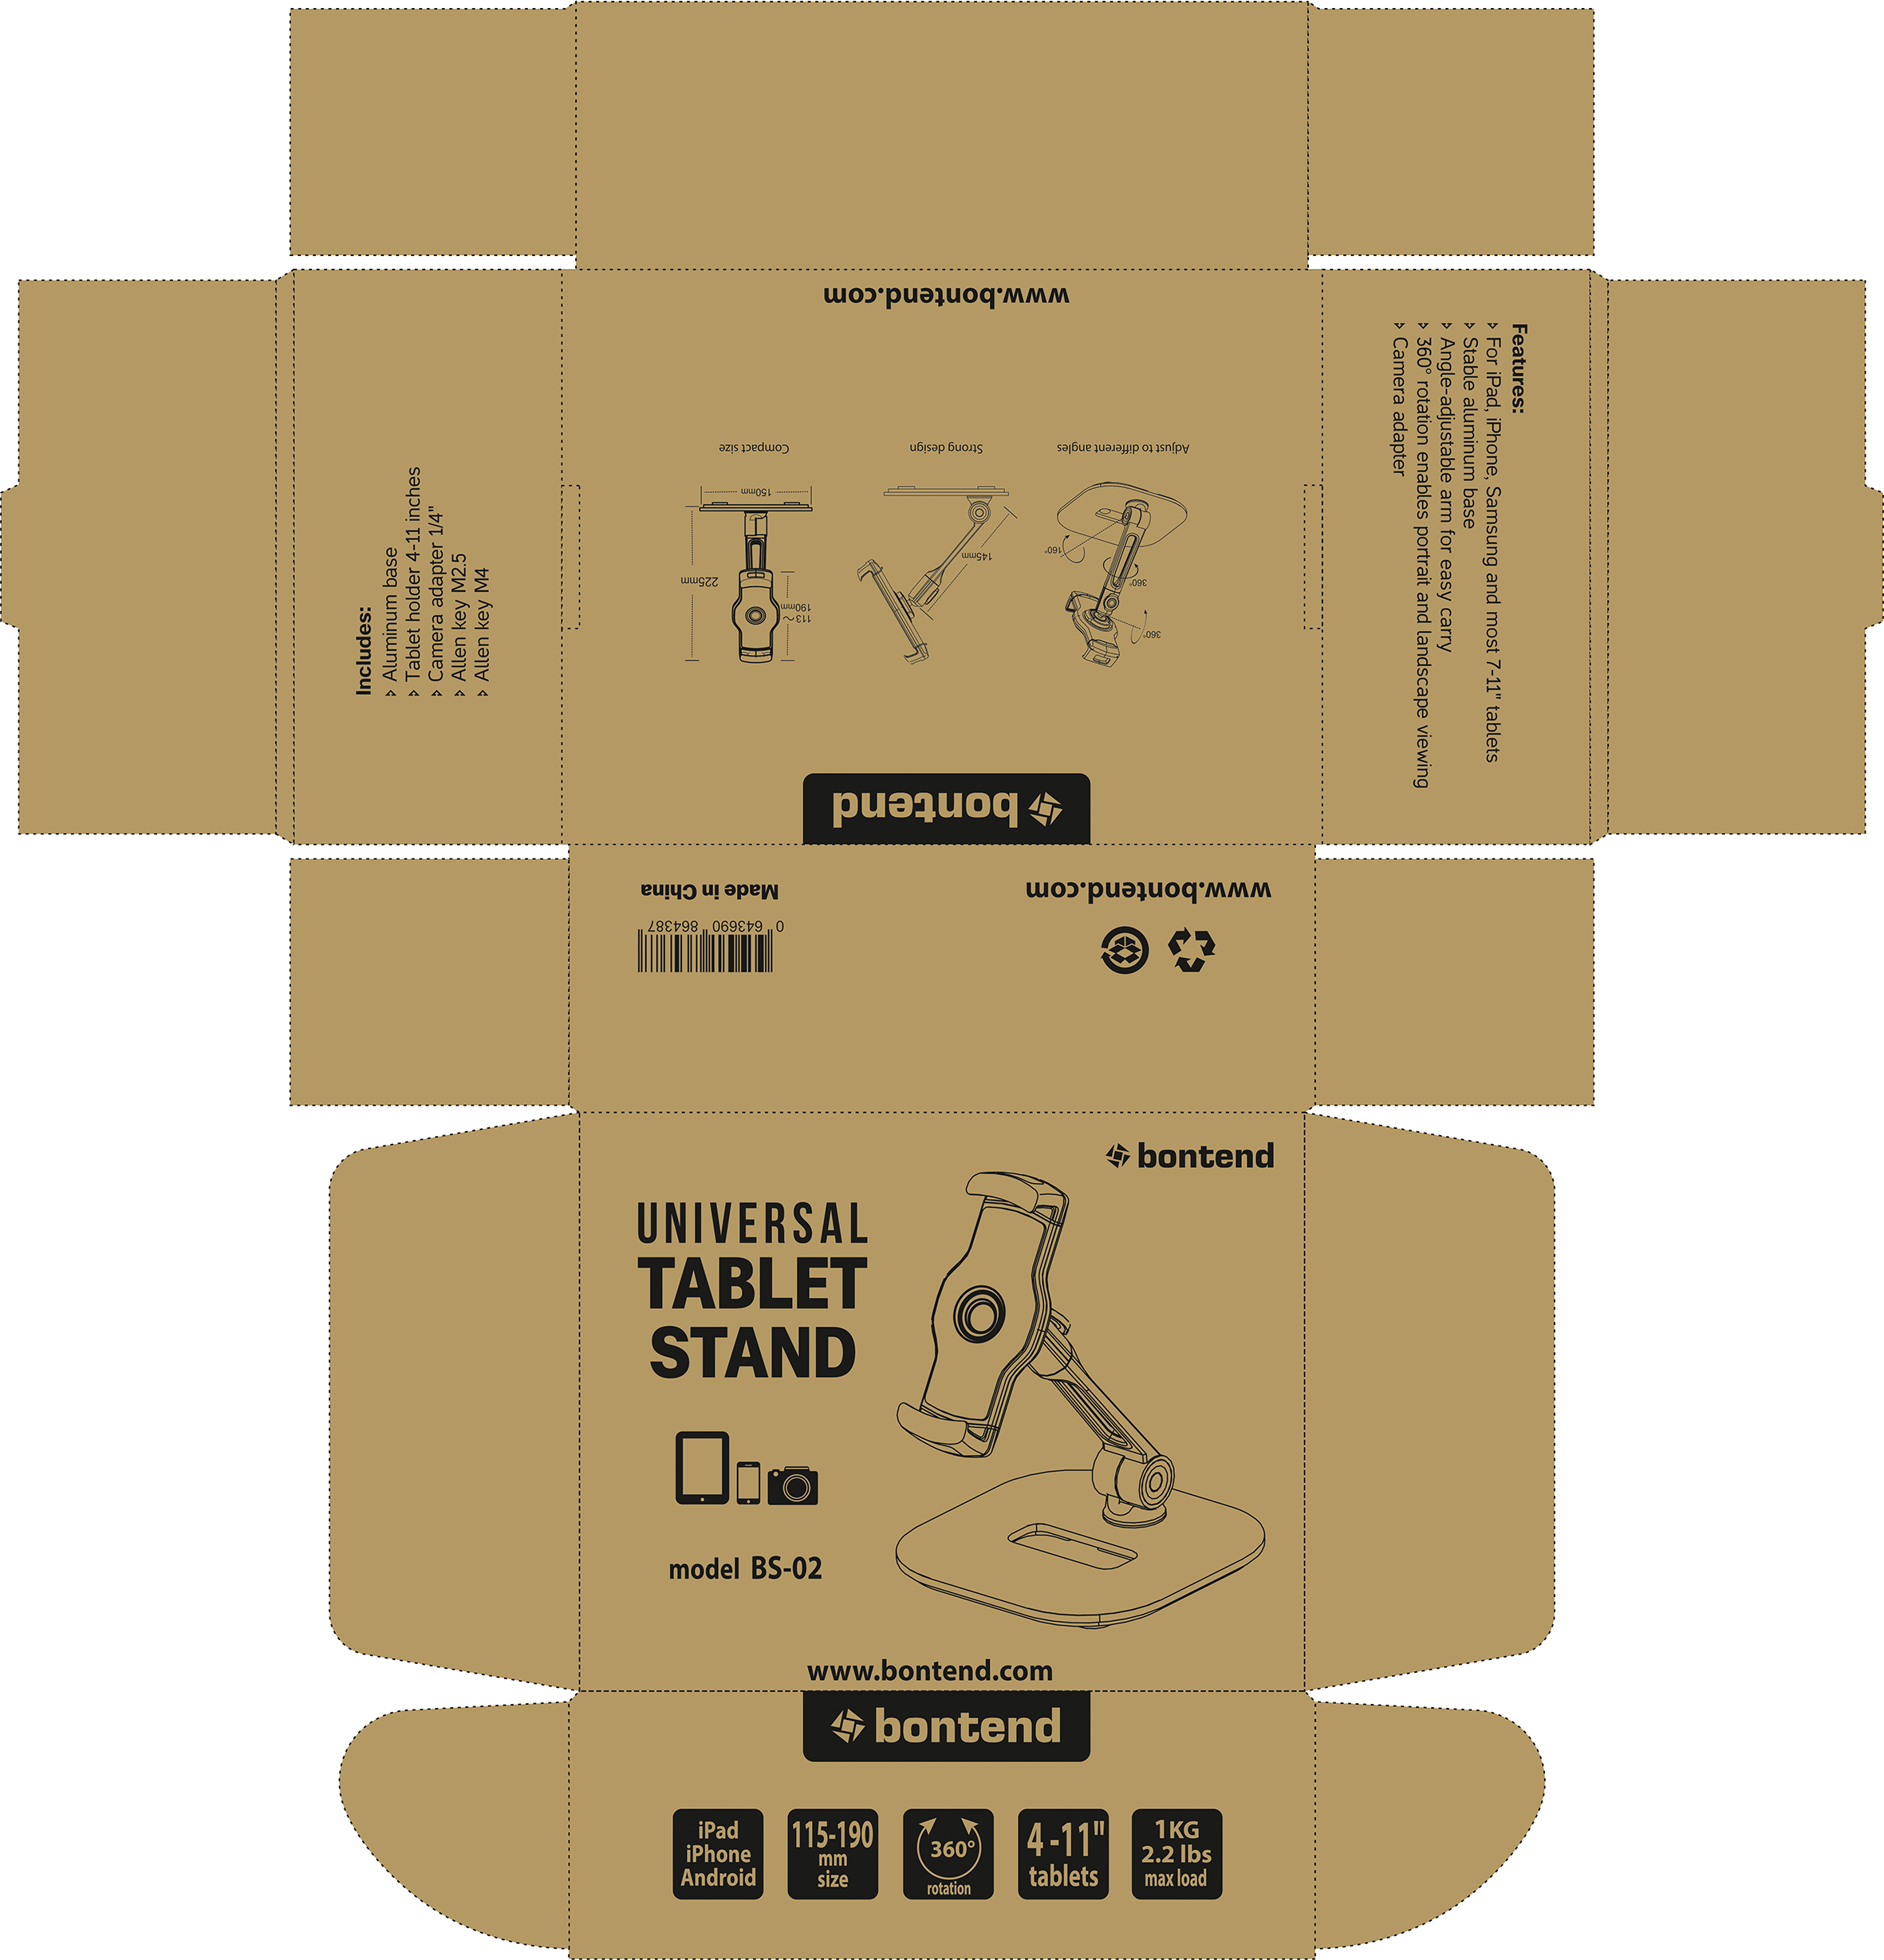 дизайн упаковки для Aliexpress